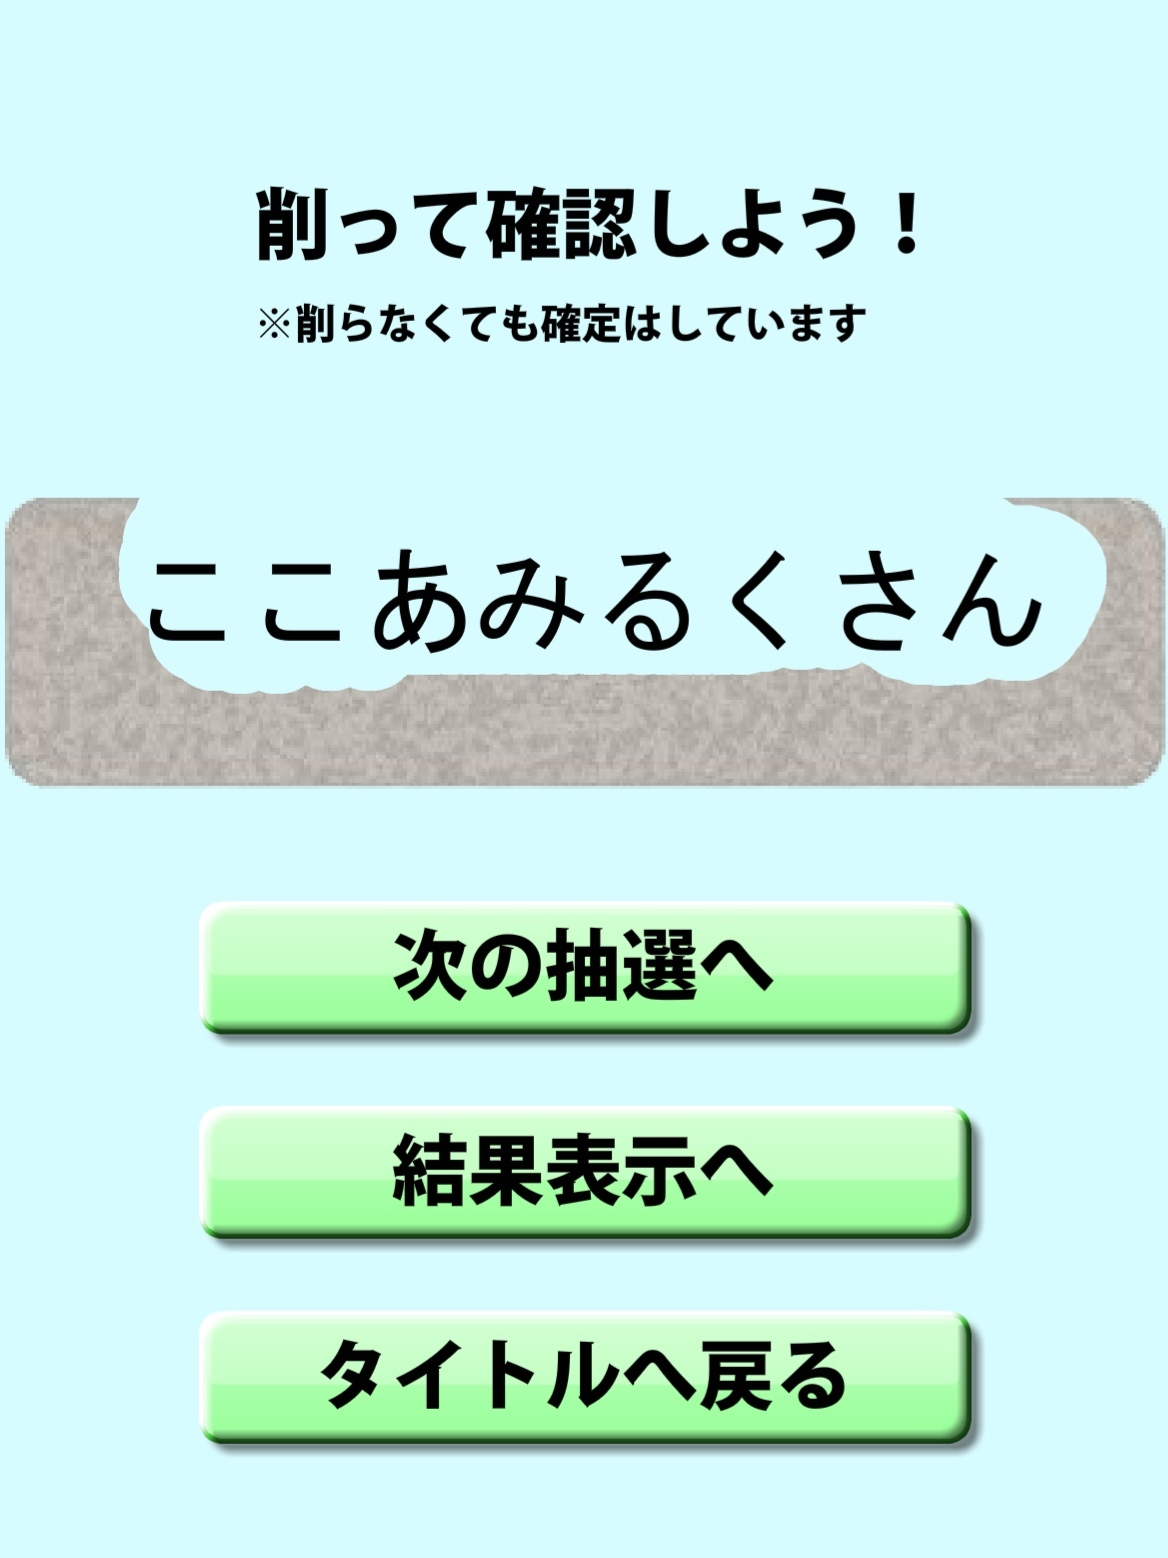 201704132107080e1.jpg